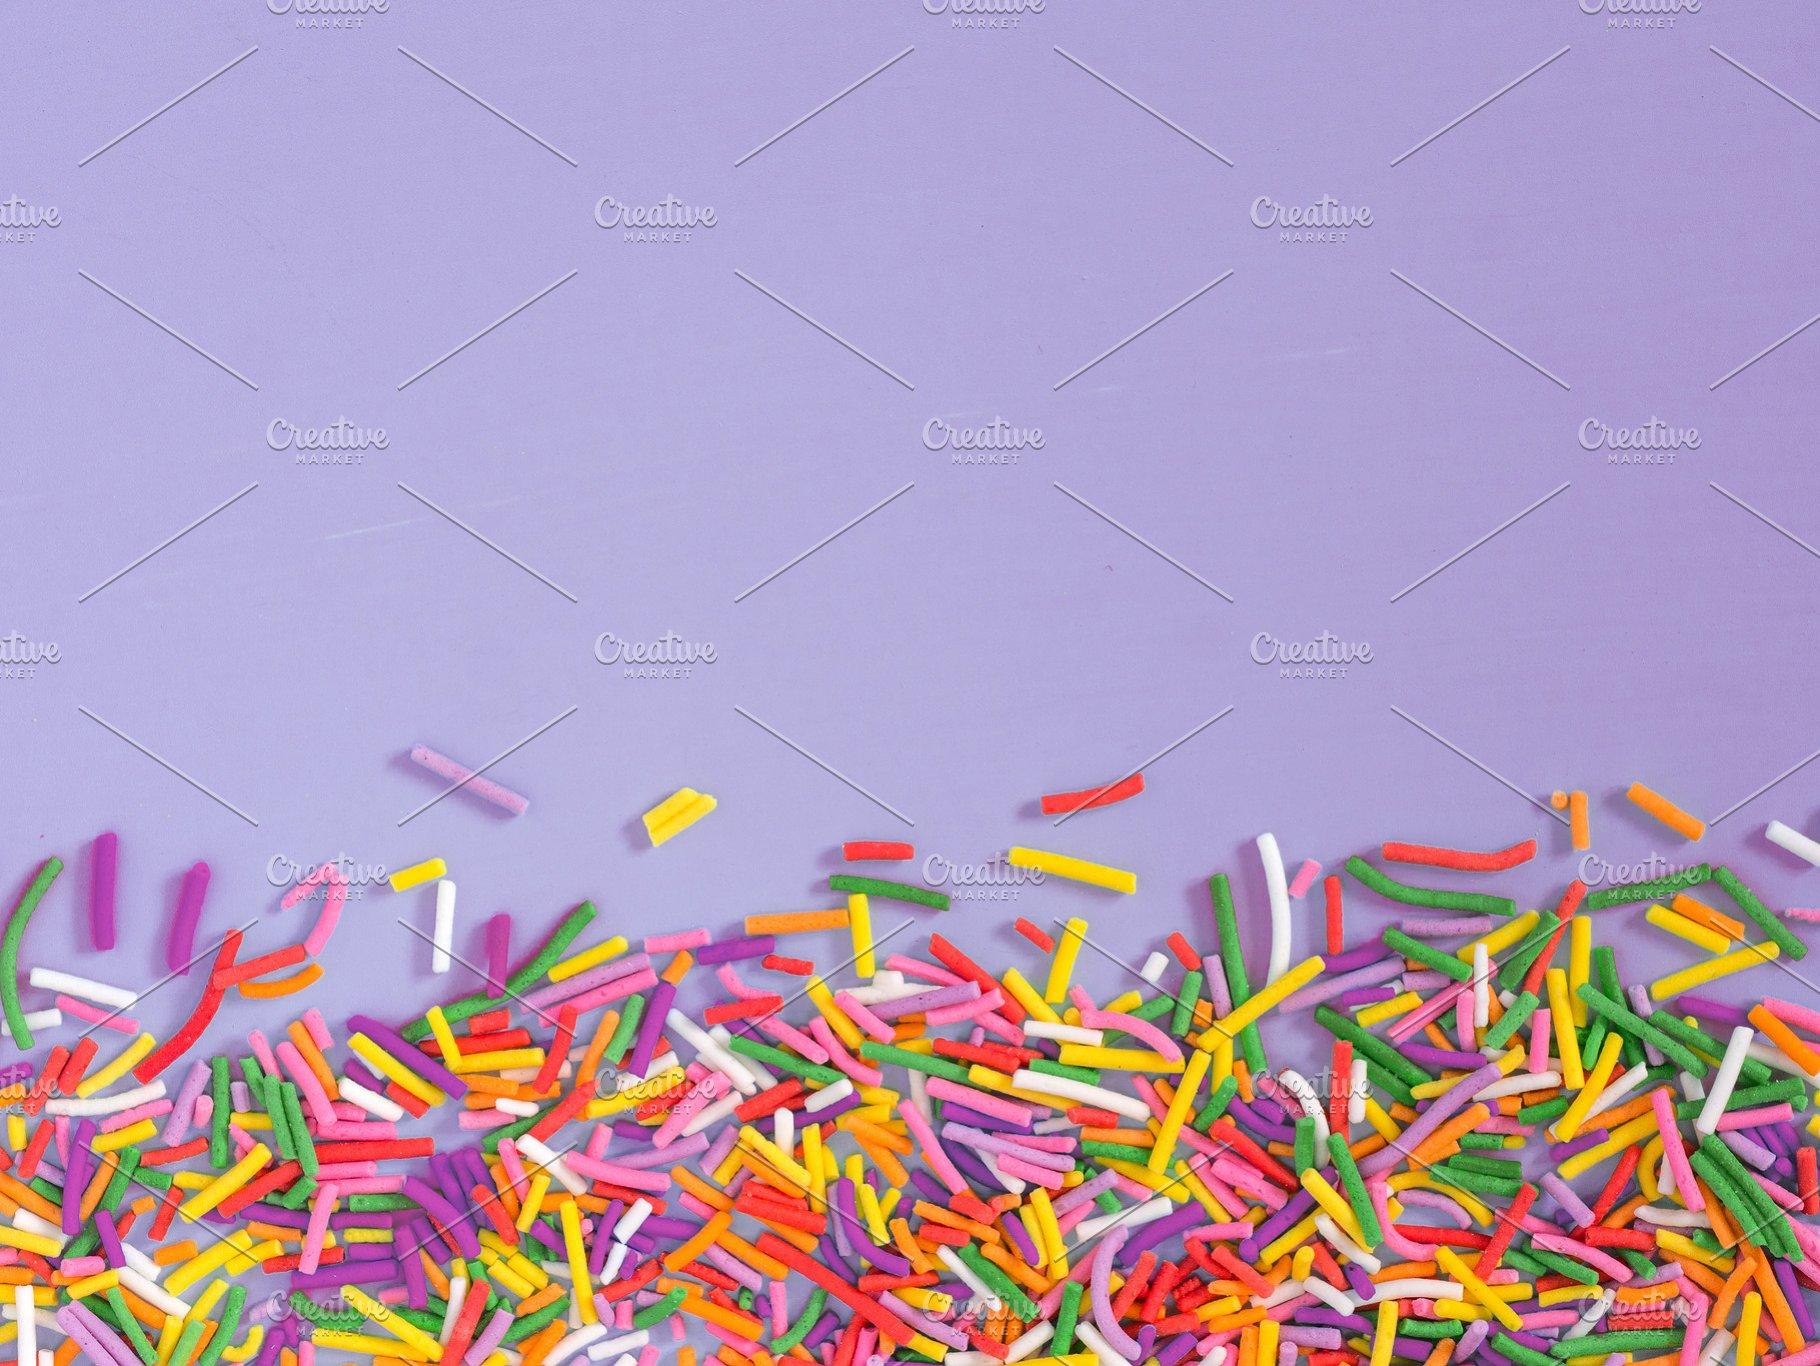 Border frame of colorful sprinkles